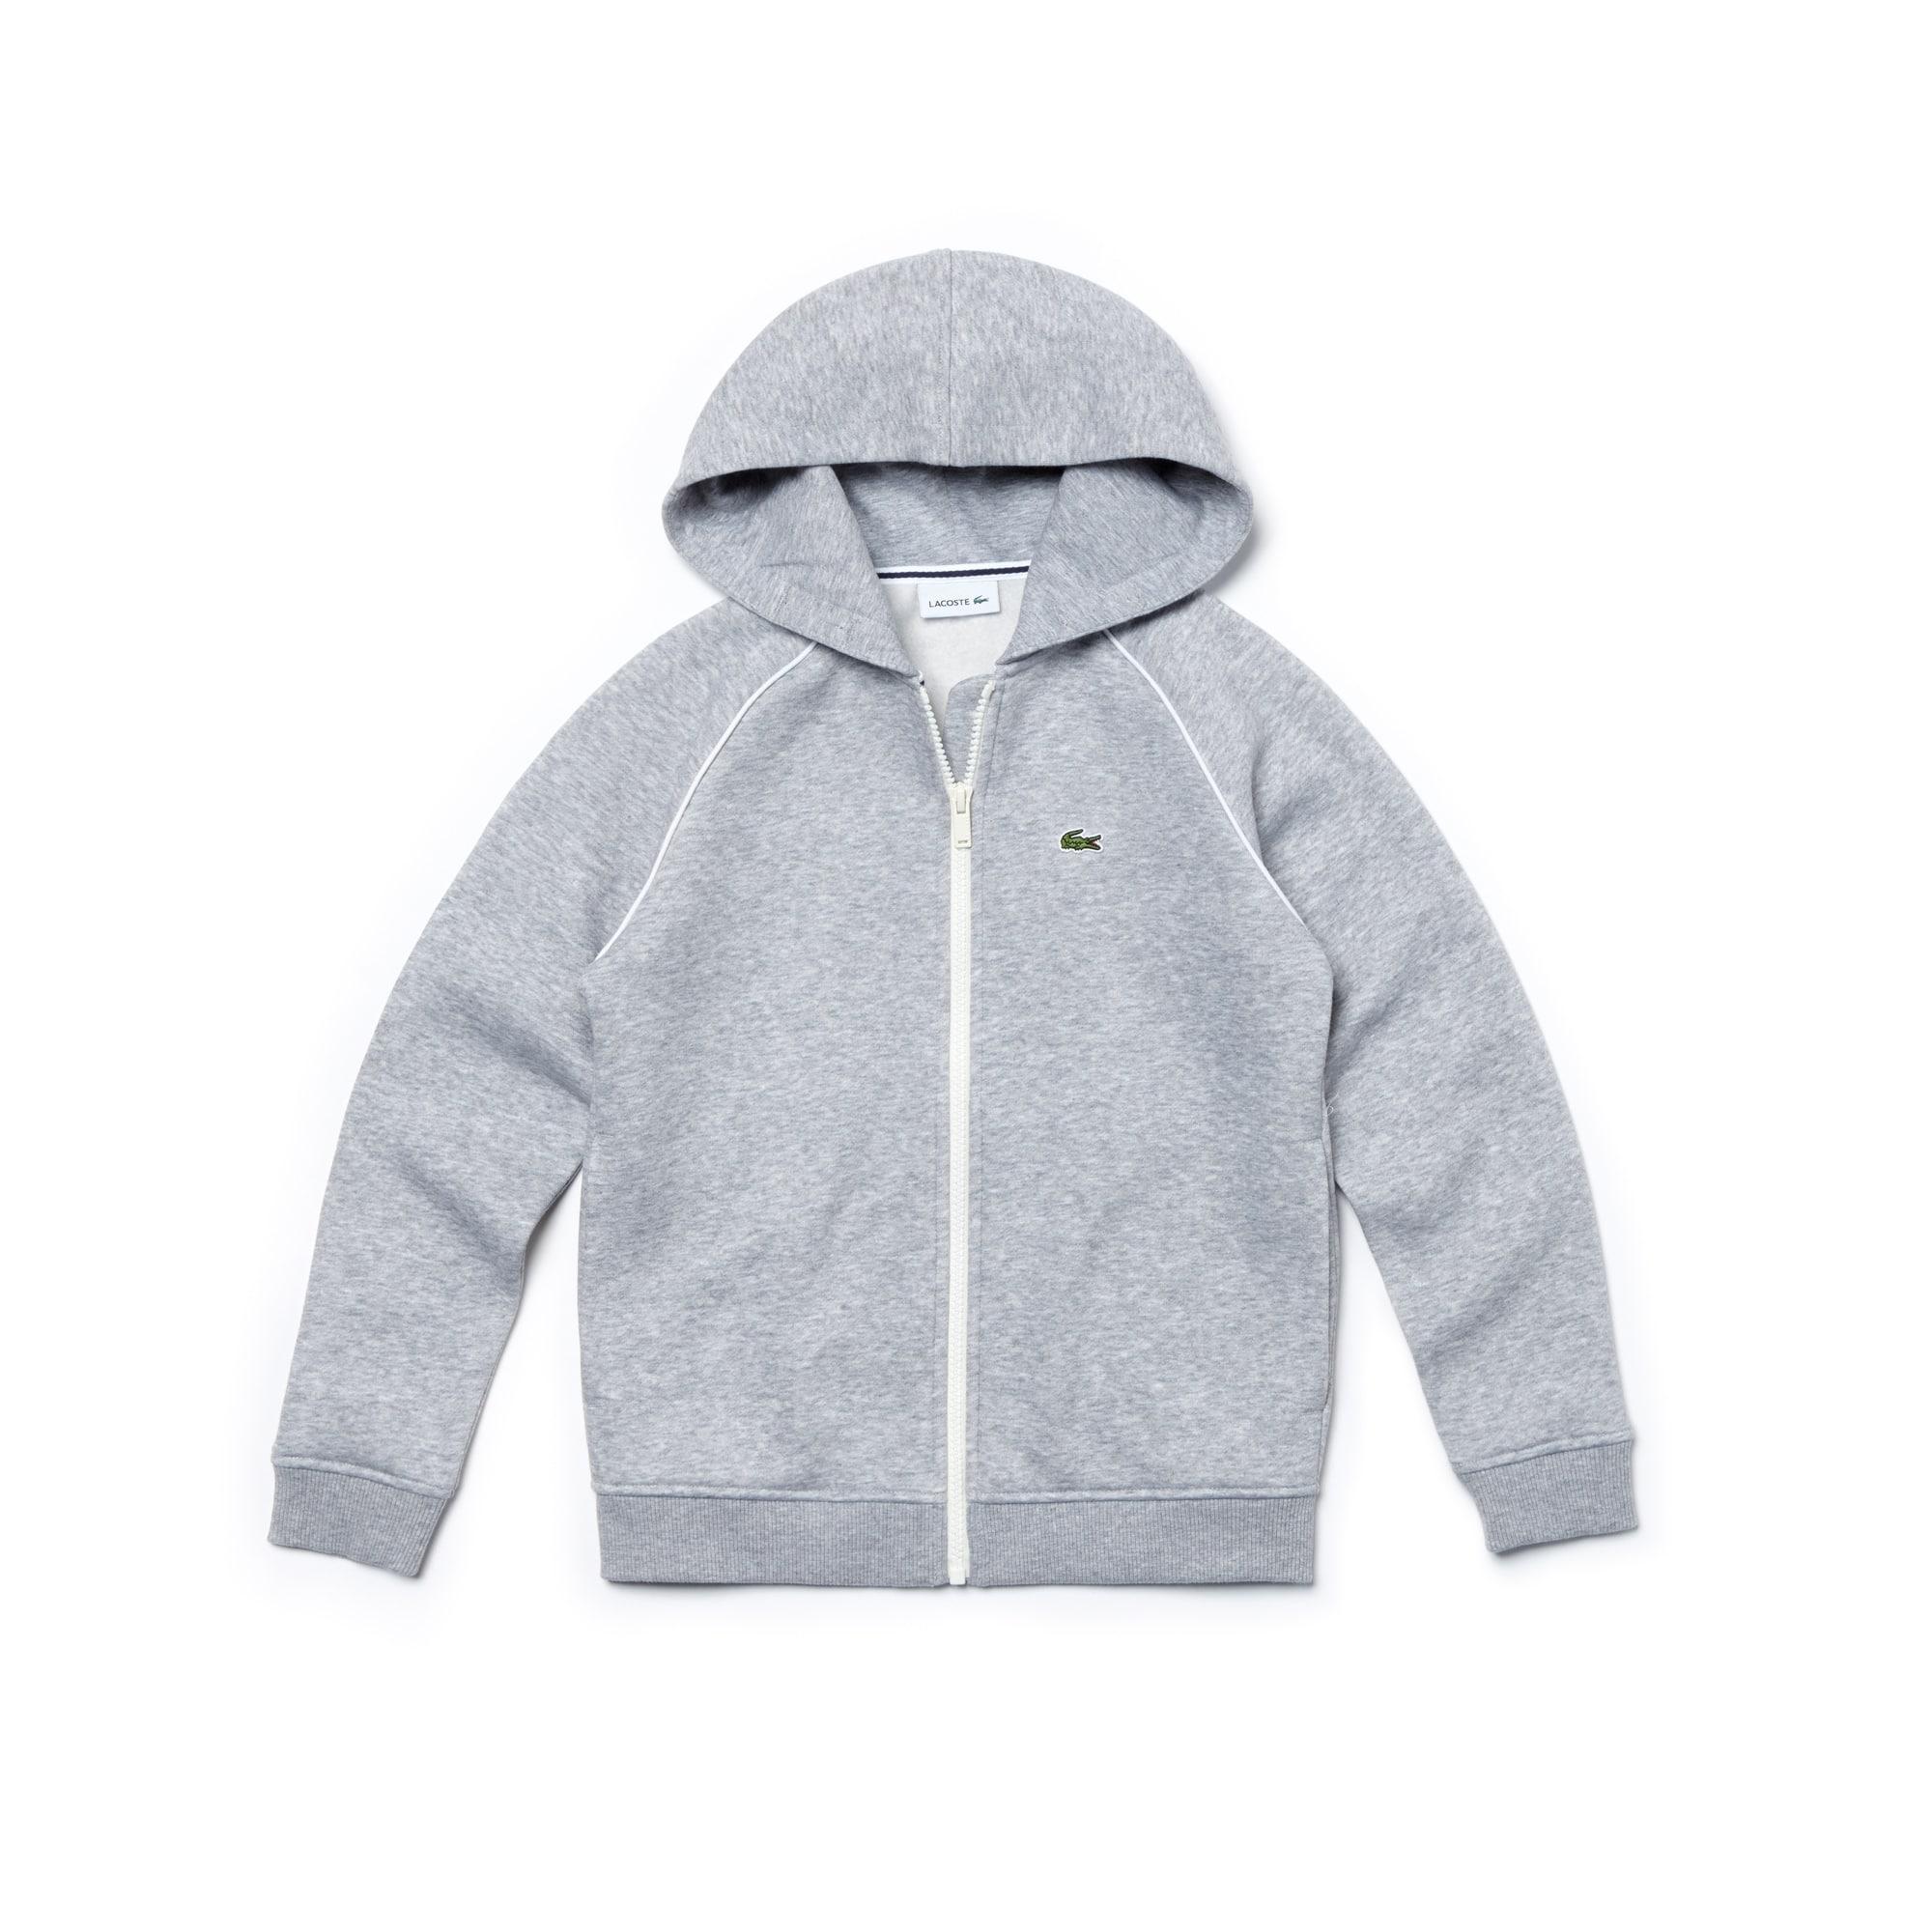 Sweatshirt zippé à capuche Garçon en molleton avec piping